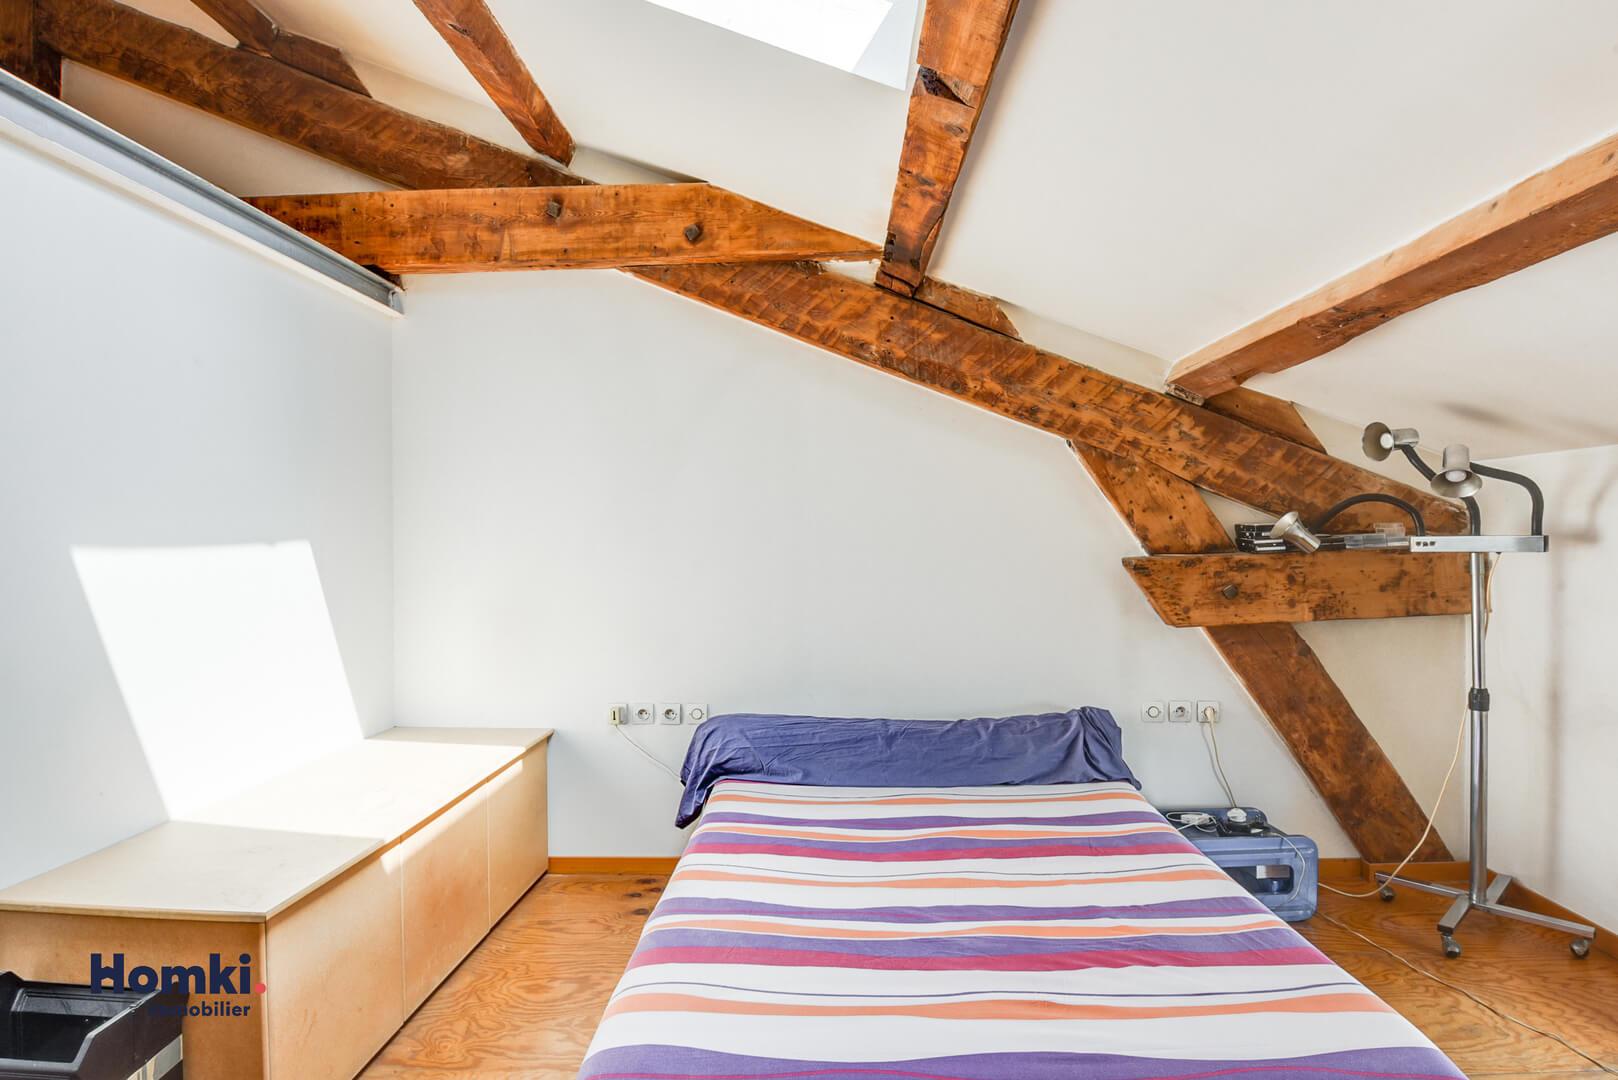 Vente loft Marseille T3 13013 130m²_9